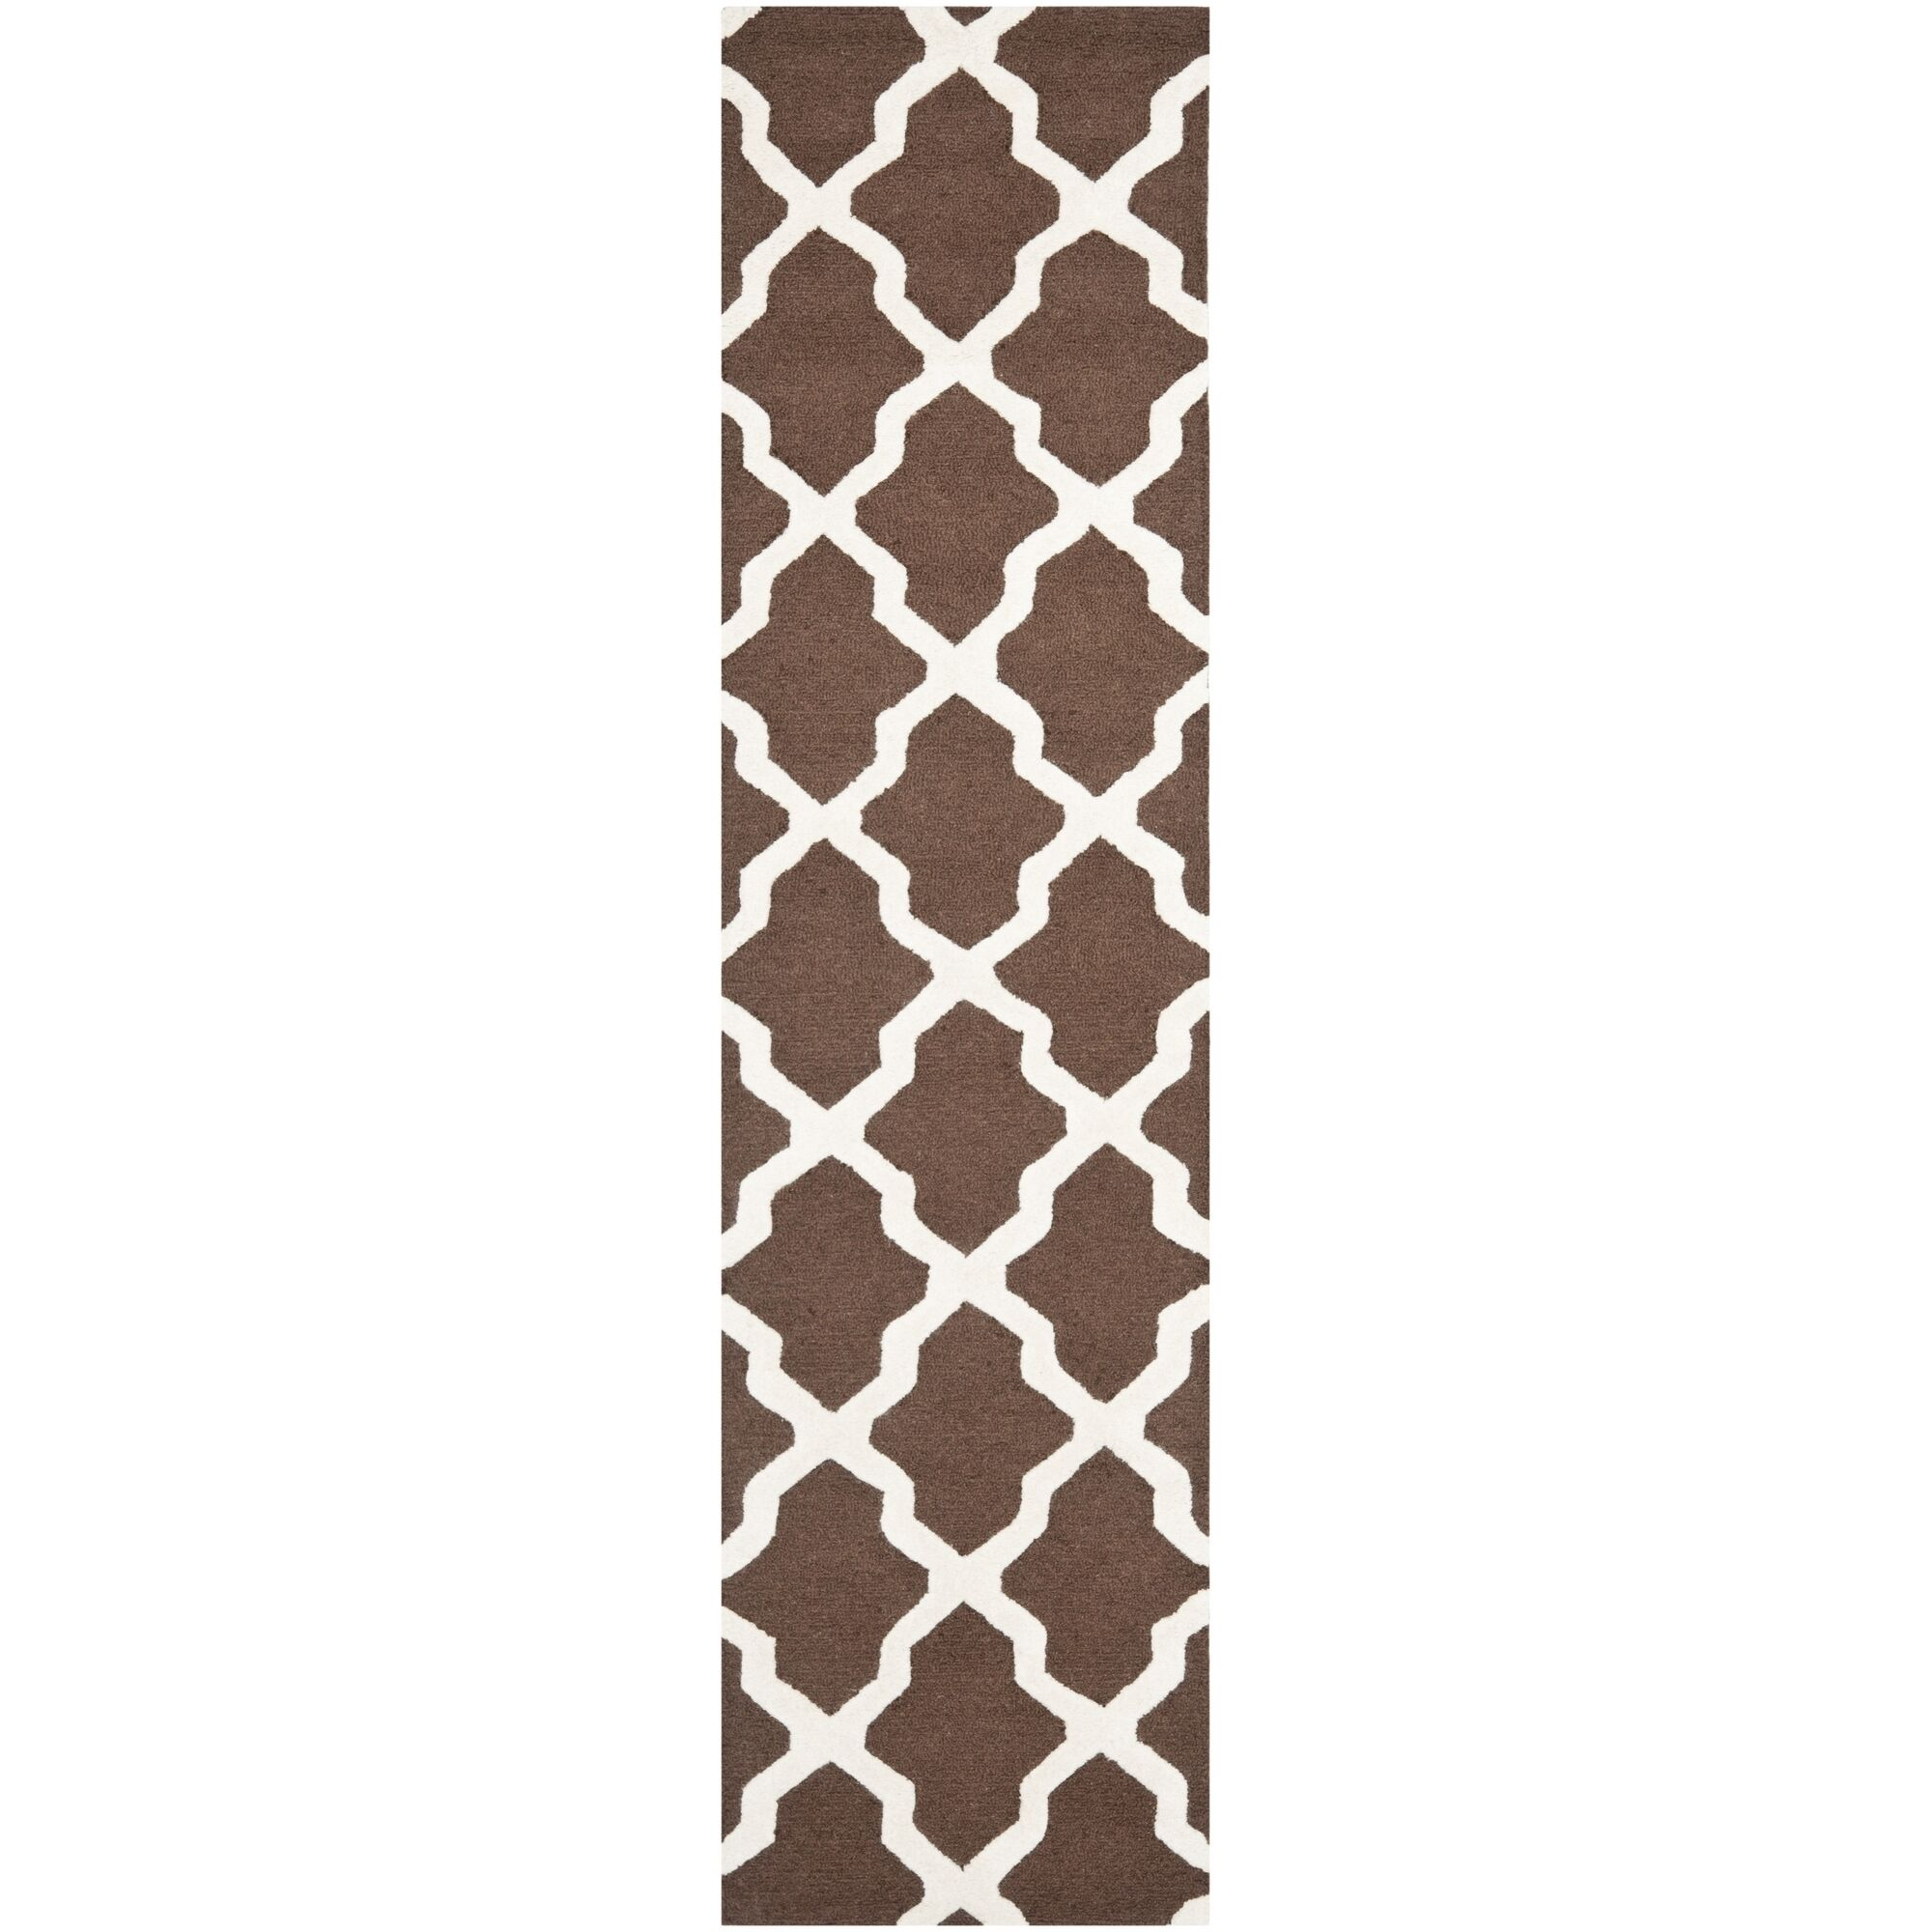 Charlenne Hand-Tufted Wool Dark Brown/Ivory Area Rug Rug Size: Runner 2'6